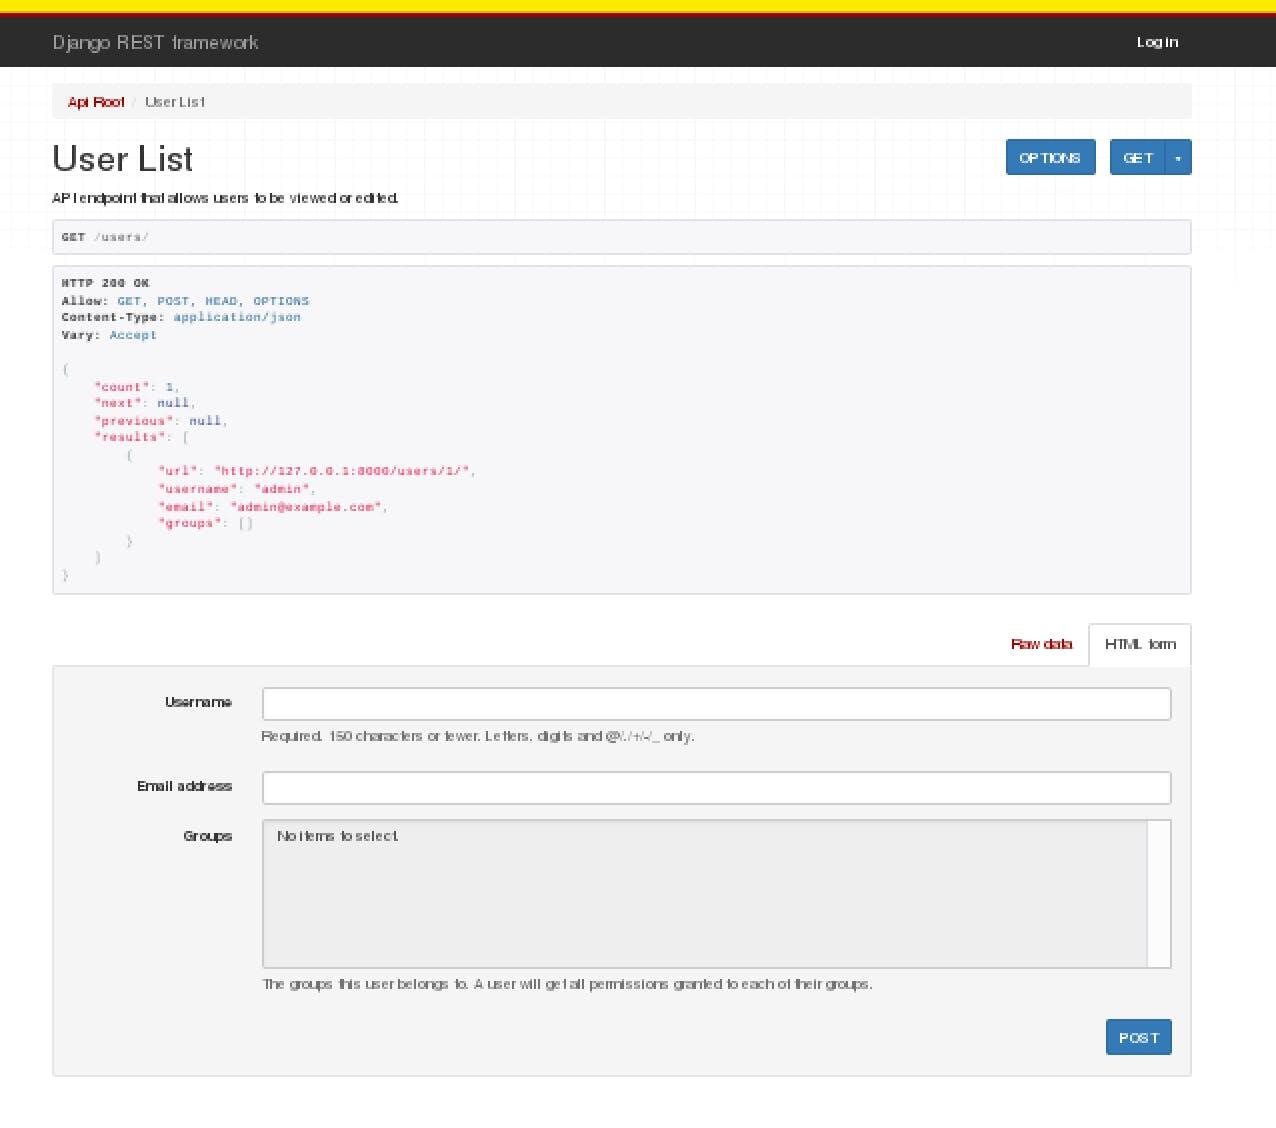 Django REST Frameworkチュートリアルをやってみた(1) -Quickstart- - Qiita